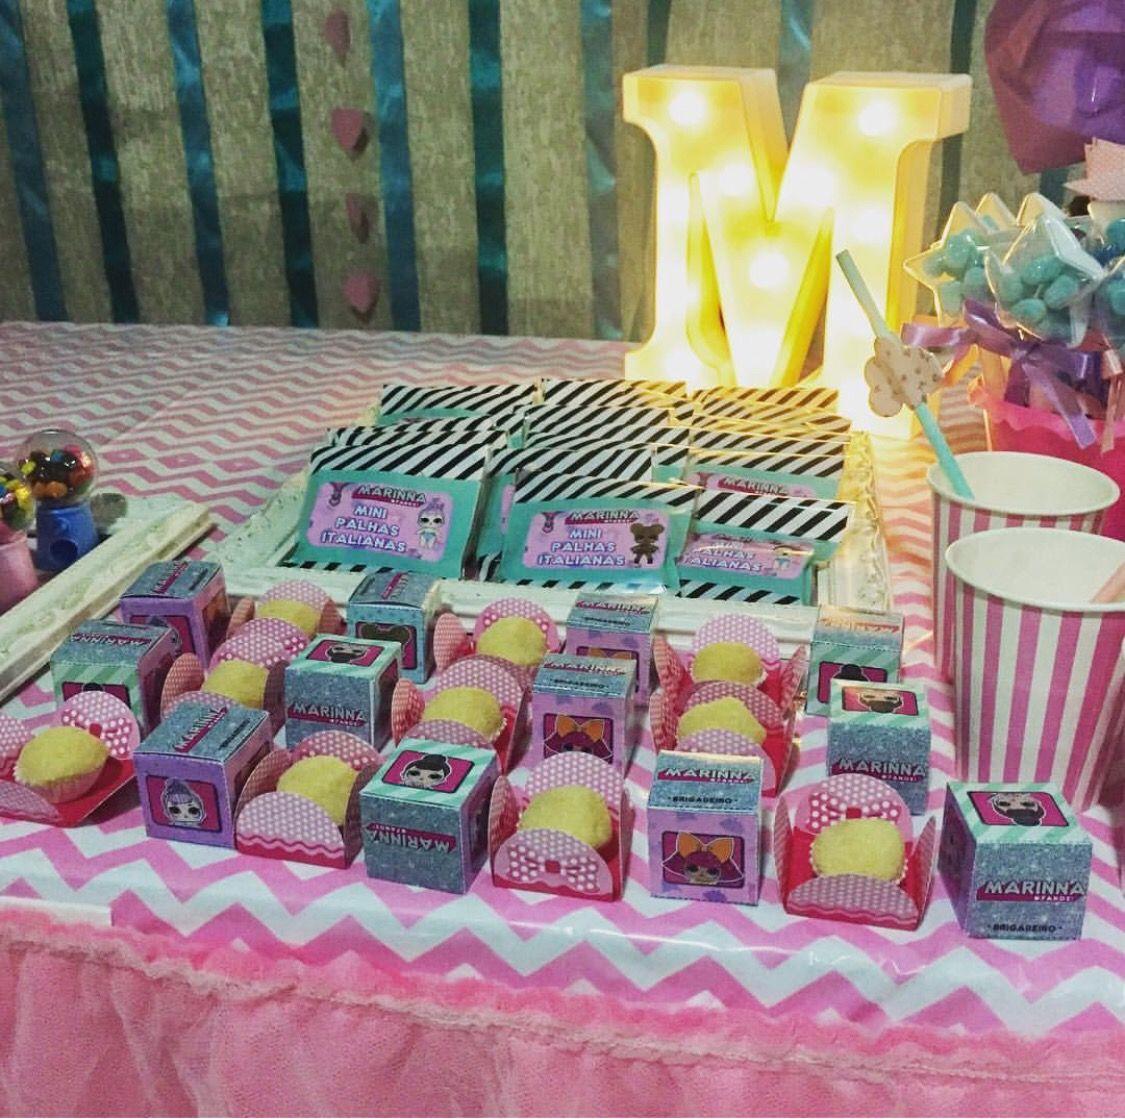 LOL Surprise Dolls Dessert Table Set Up